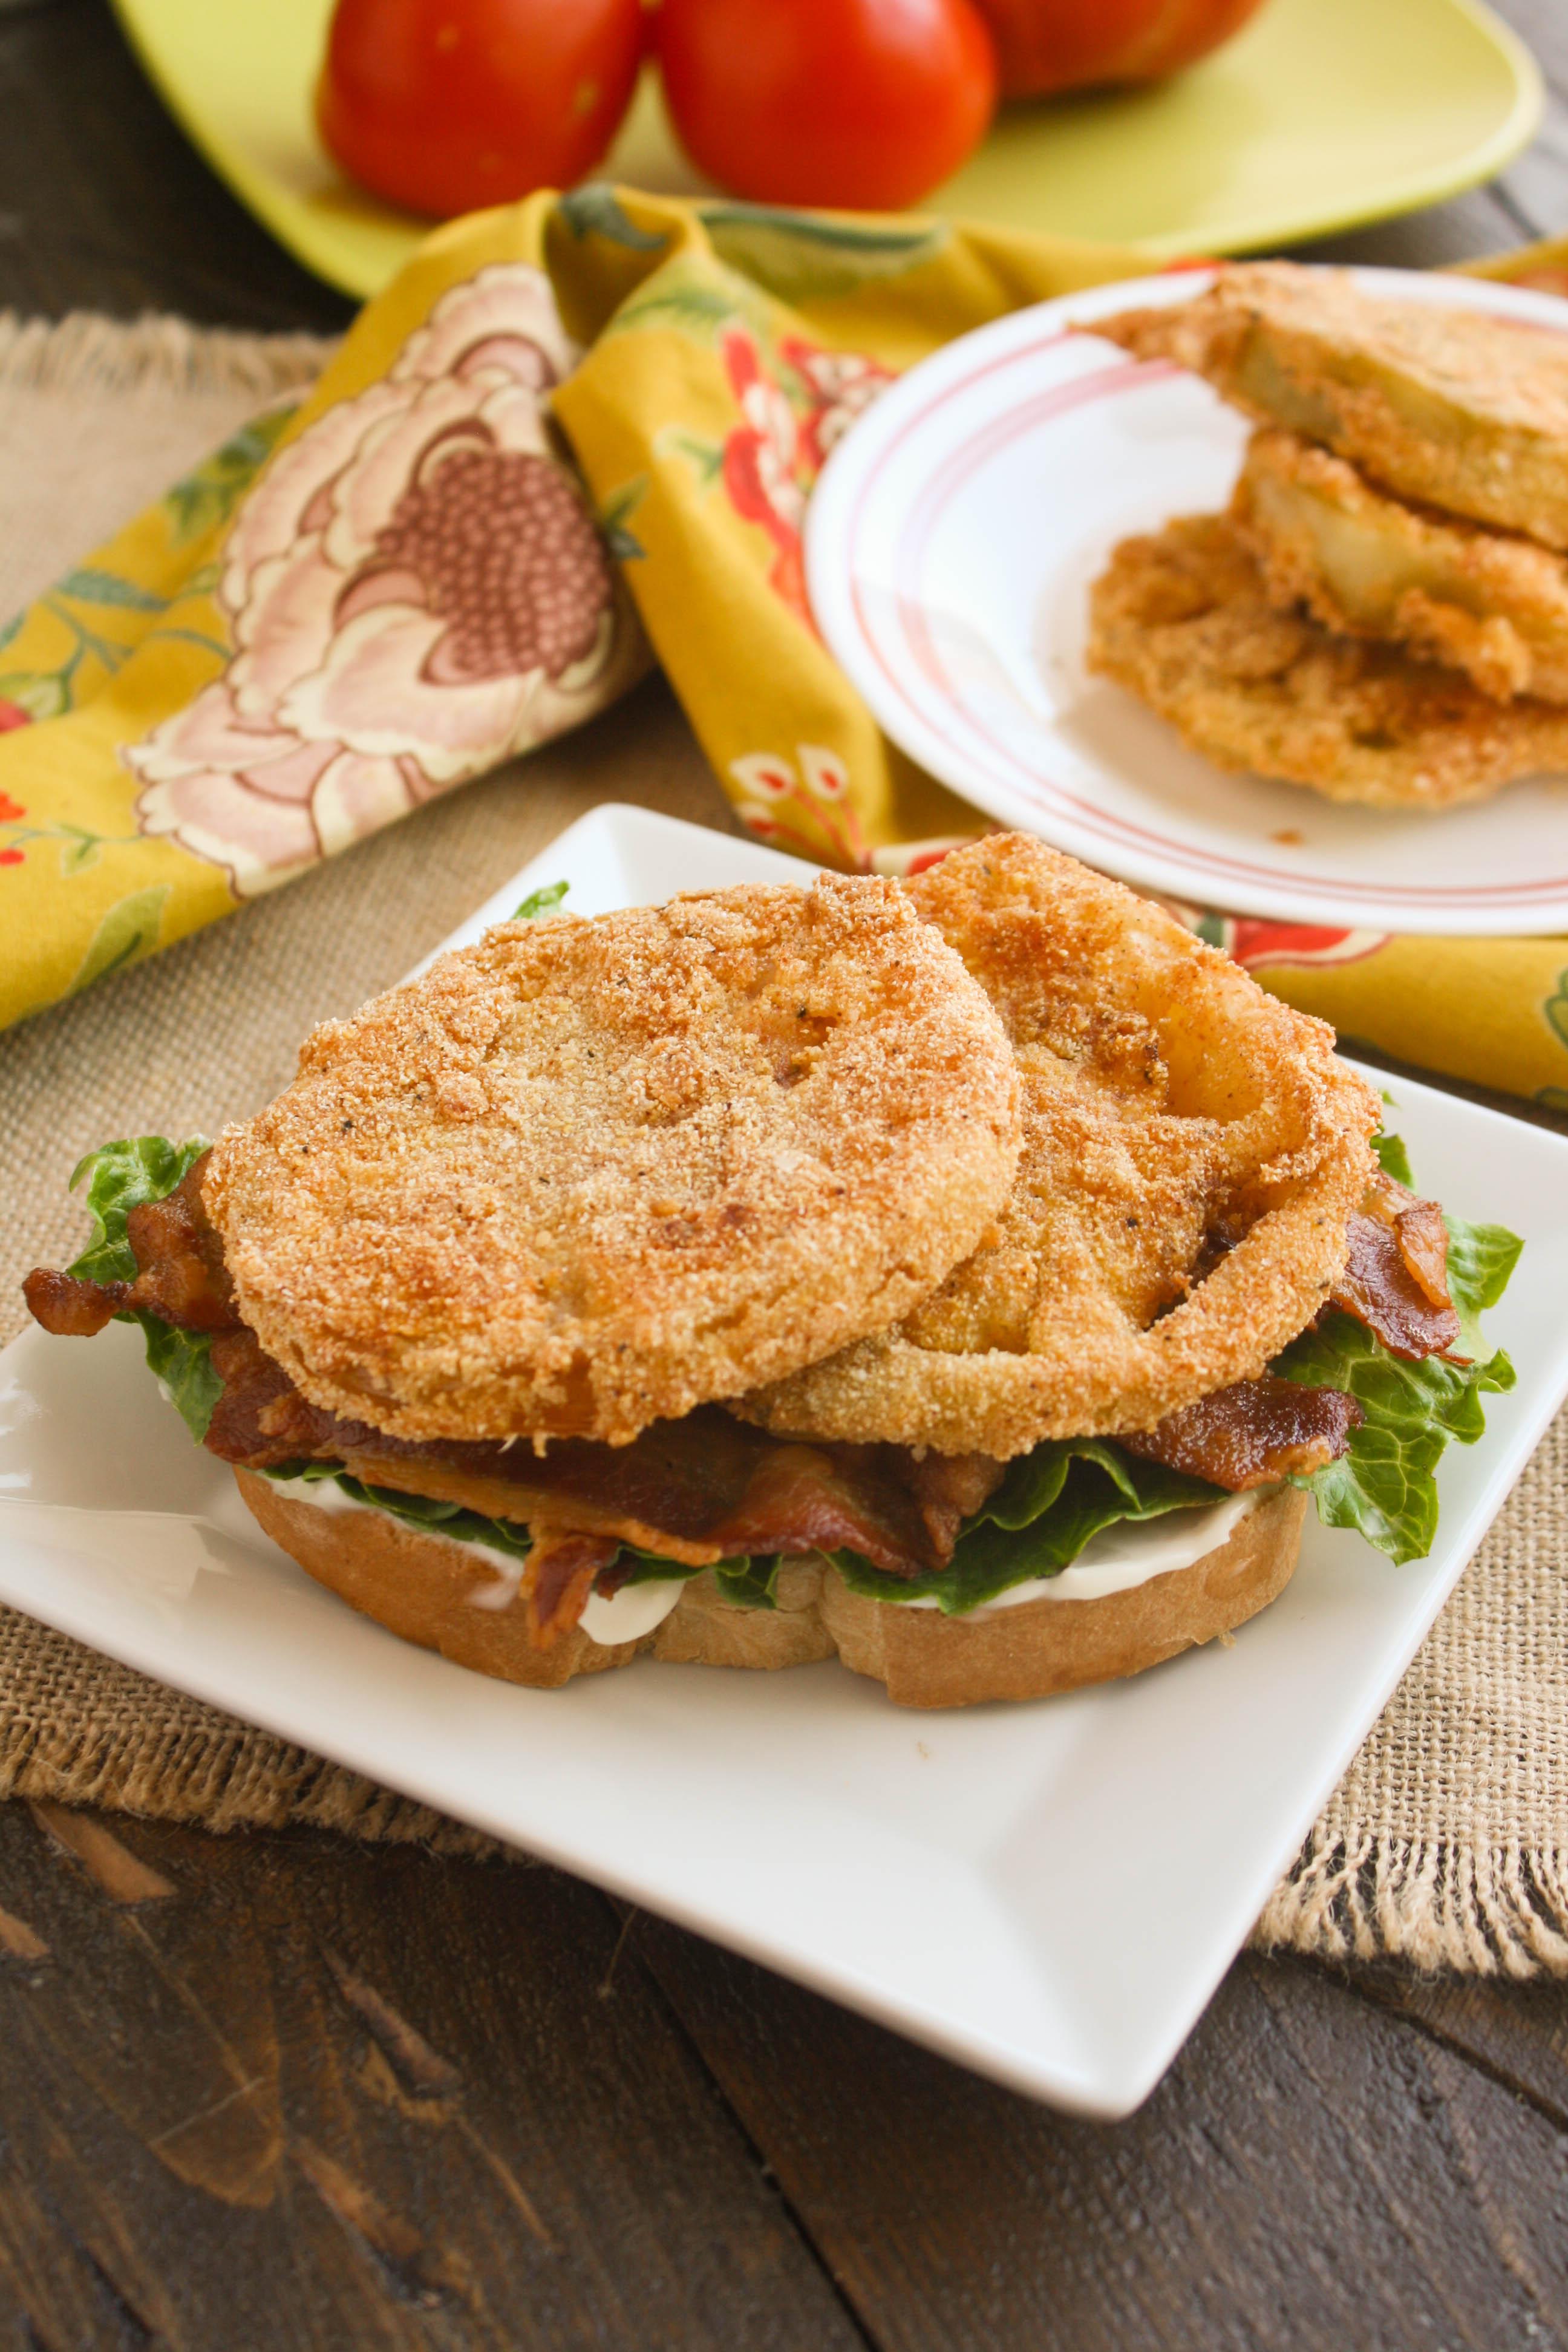 Fried-Green-Tomato-BLT-Sandwiches1-7344b64390da02569ce1e0c416a6d63edbfbece8